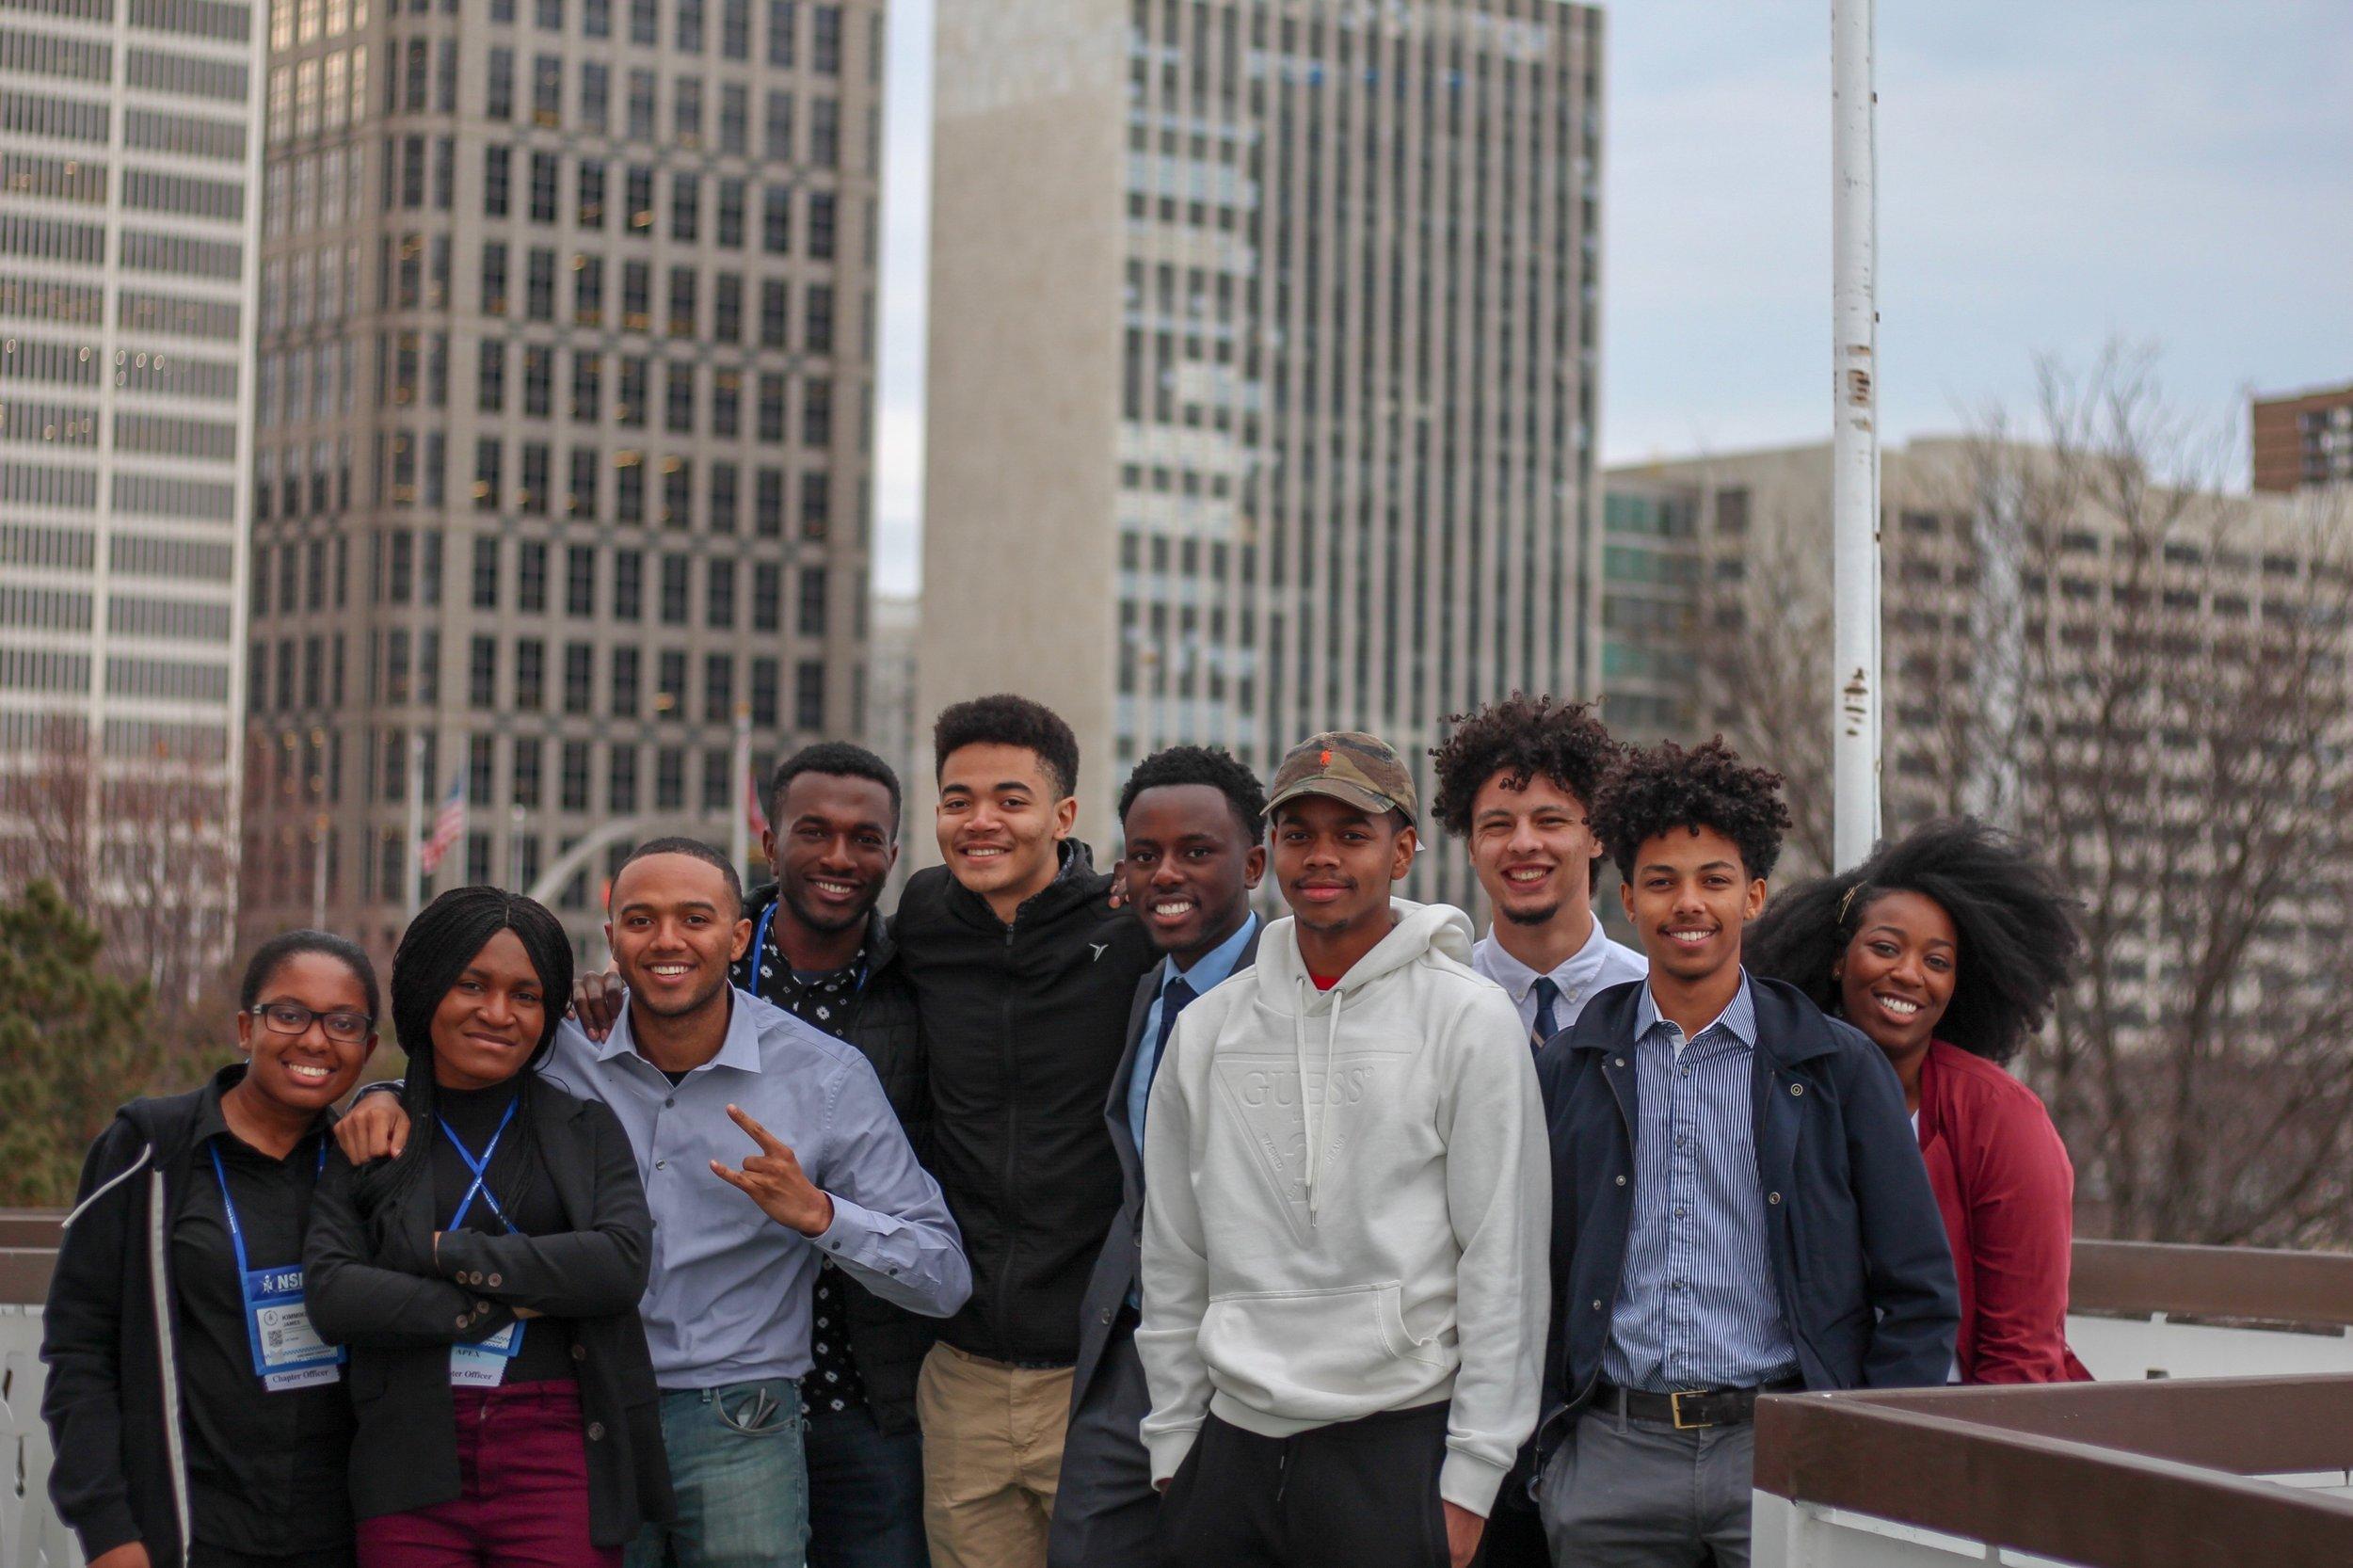 The next generation of Black STEM